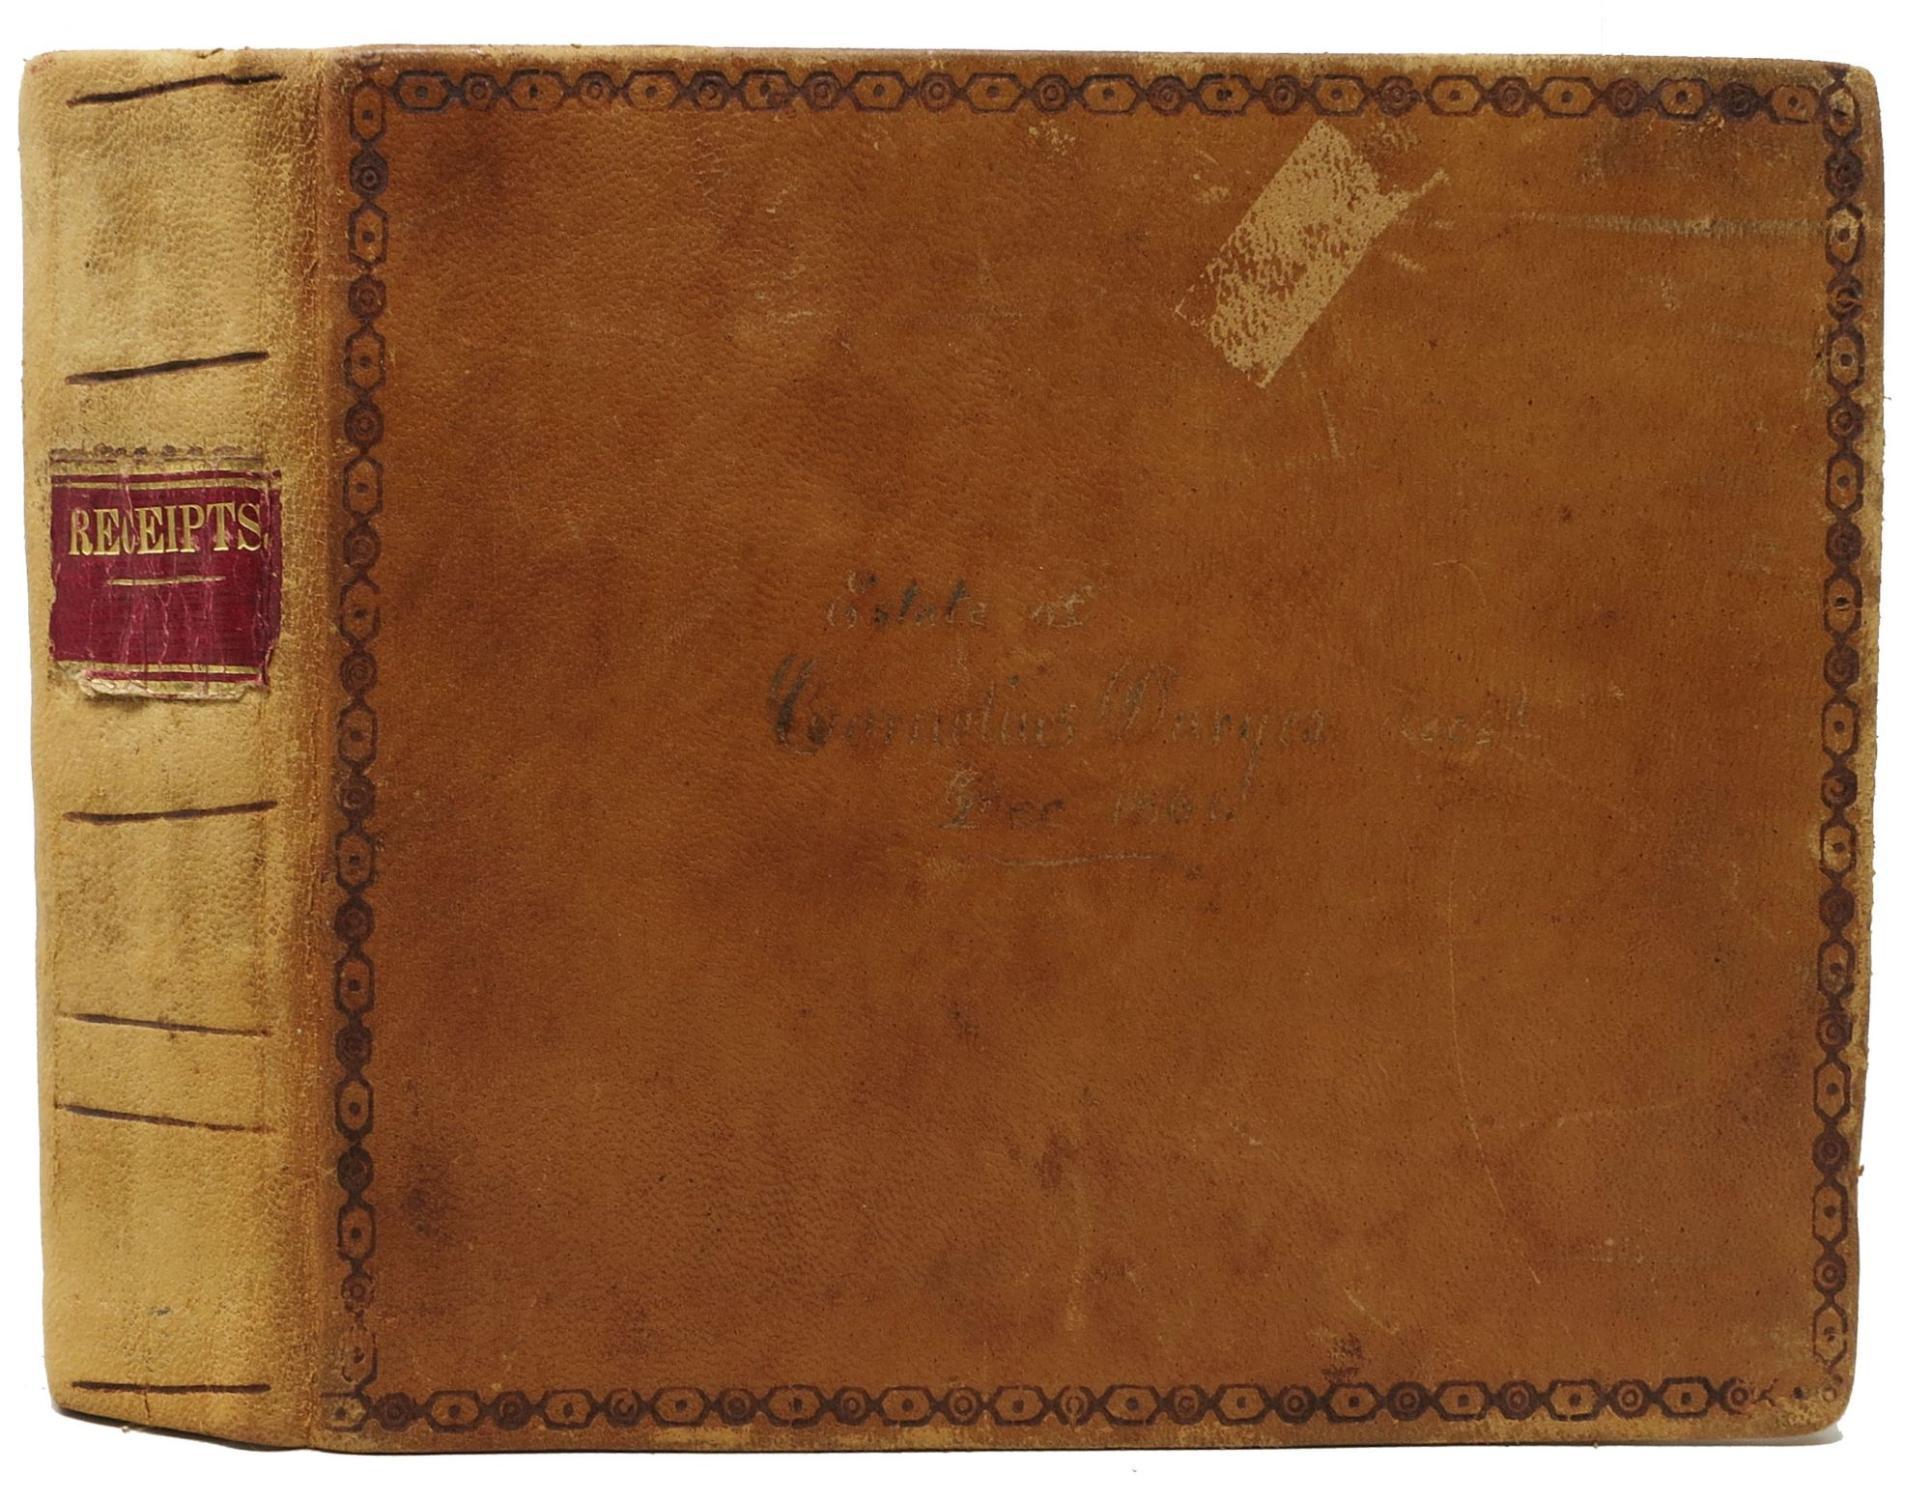 RECEIPTS FOR ESTATE OF CORNELIUS DURYEA: Kissam Family -